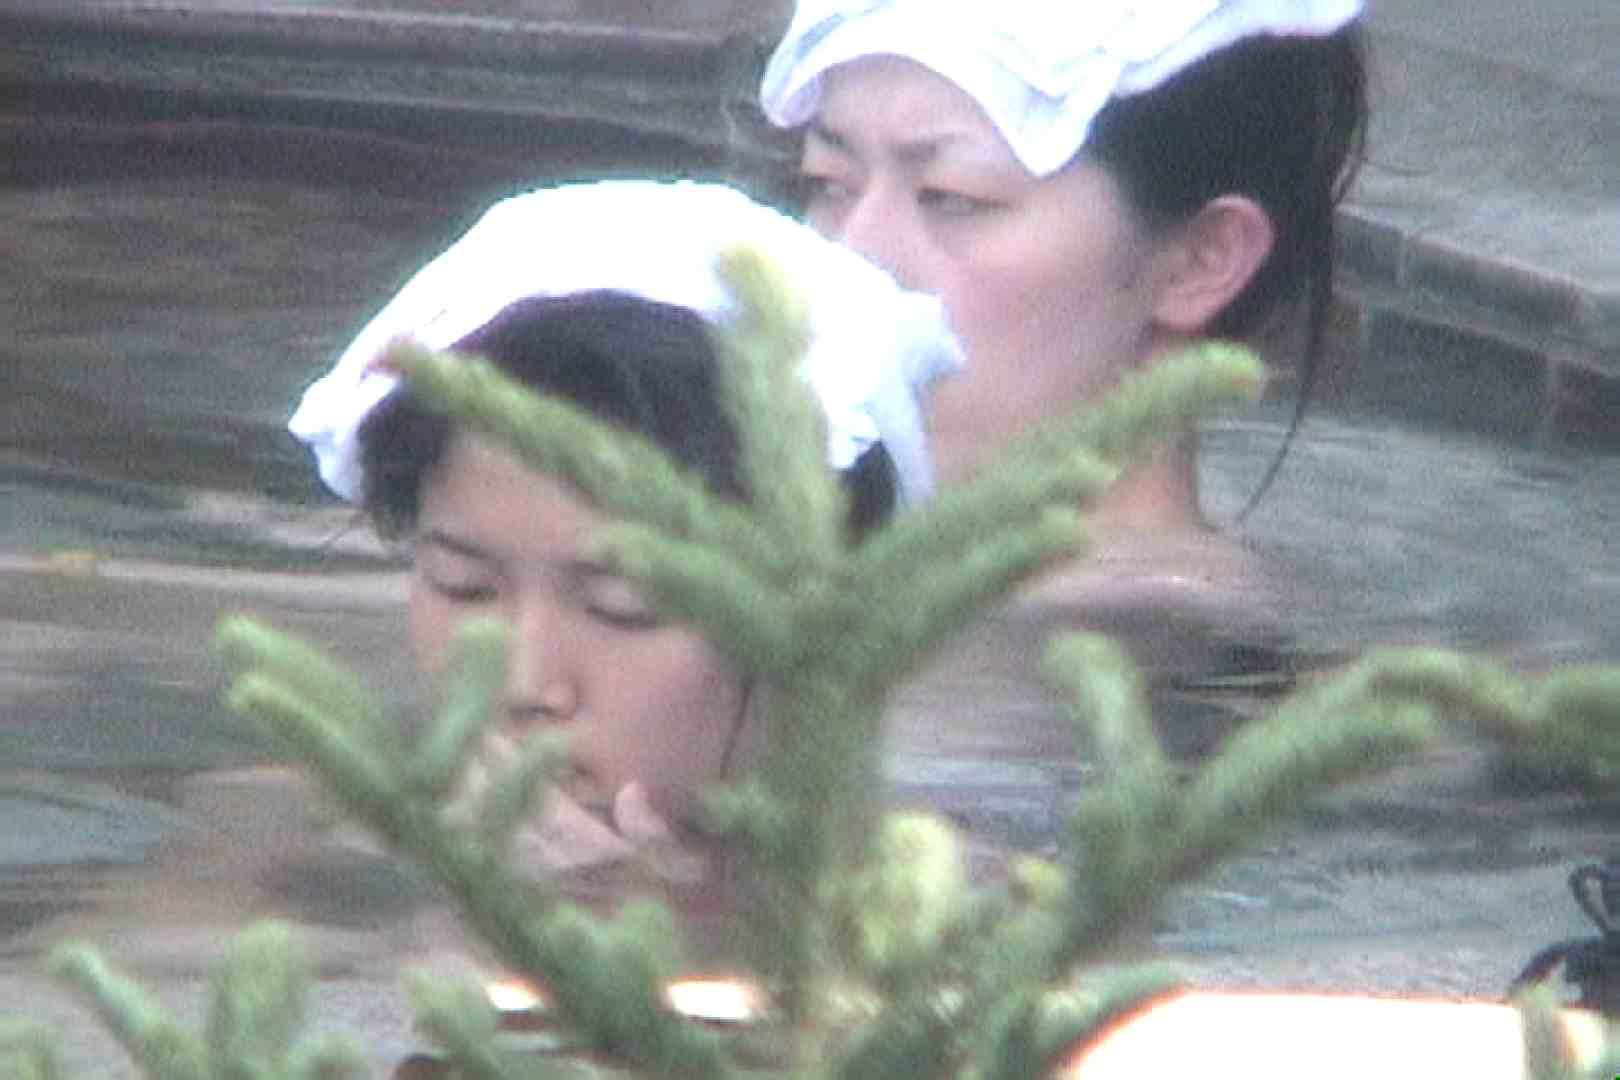 Aquaな露天風呂Vol.80【VIP限定】 露天風呂編   盗撮シリーズ  76PIX 61